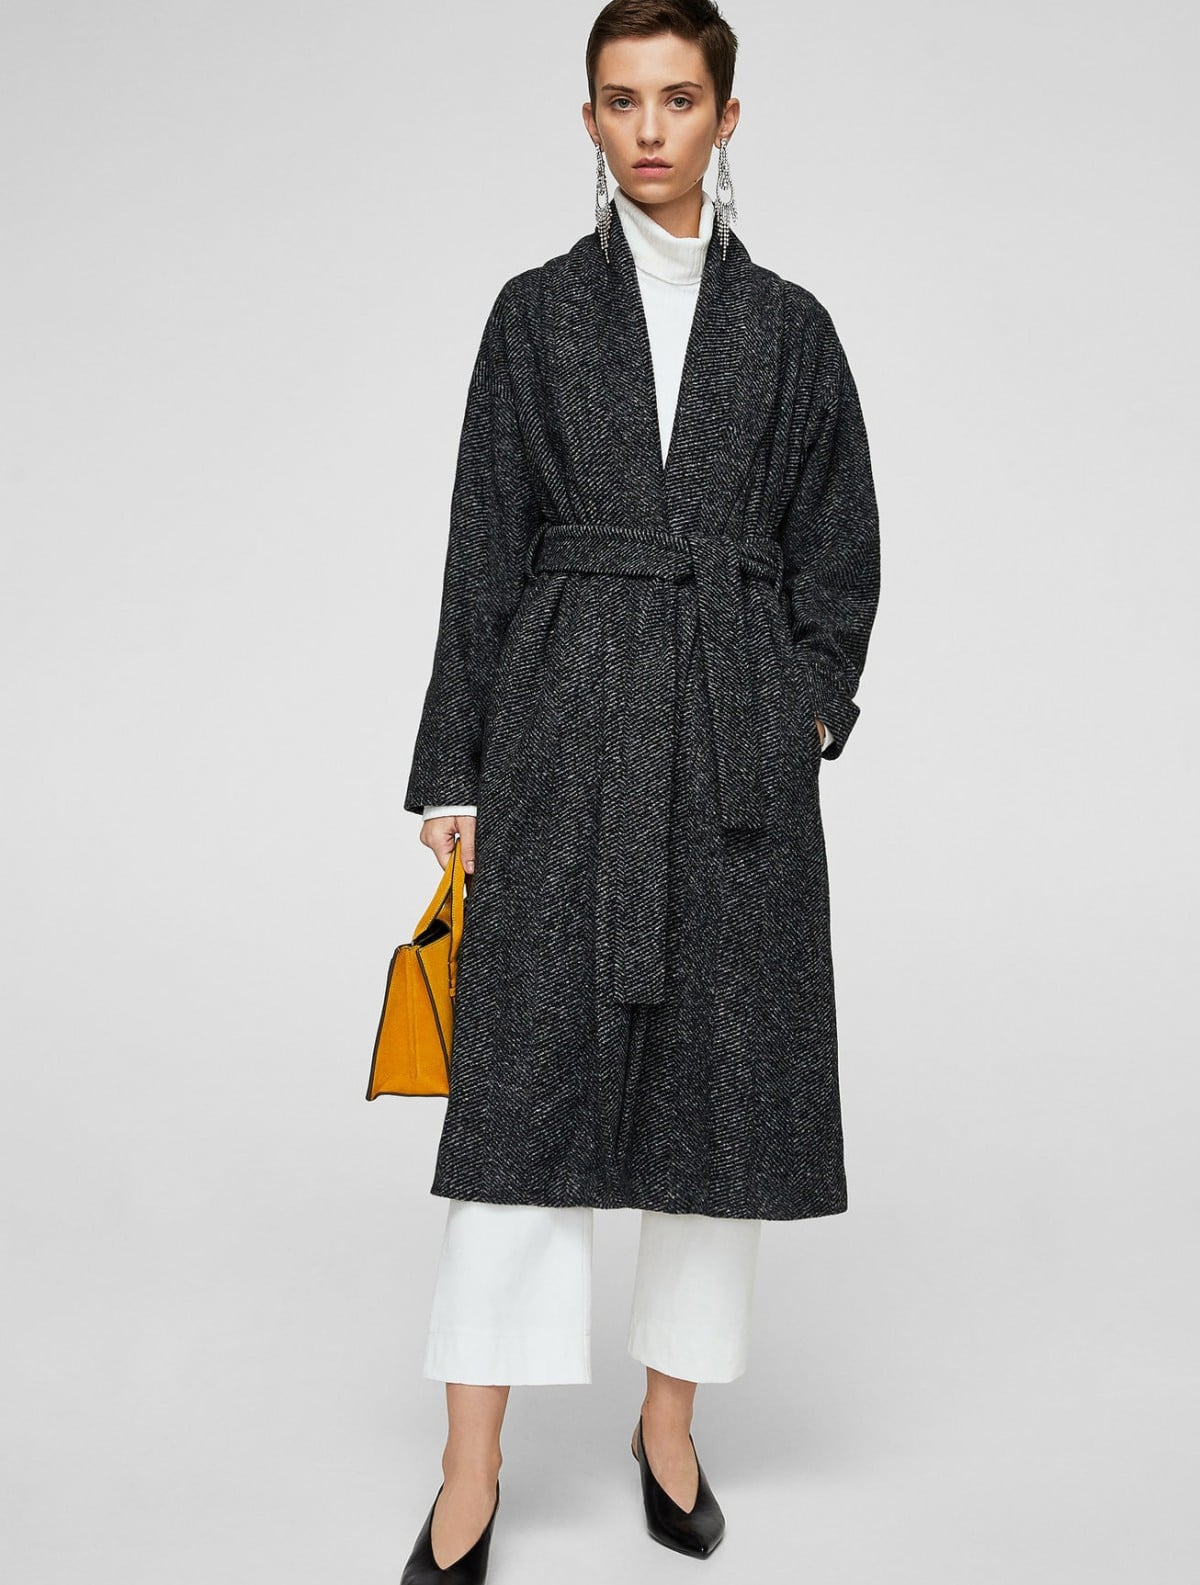 Veste automne femme mango